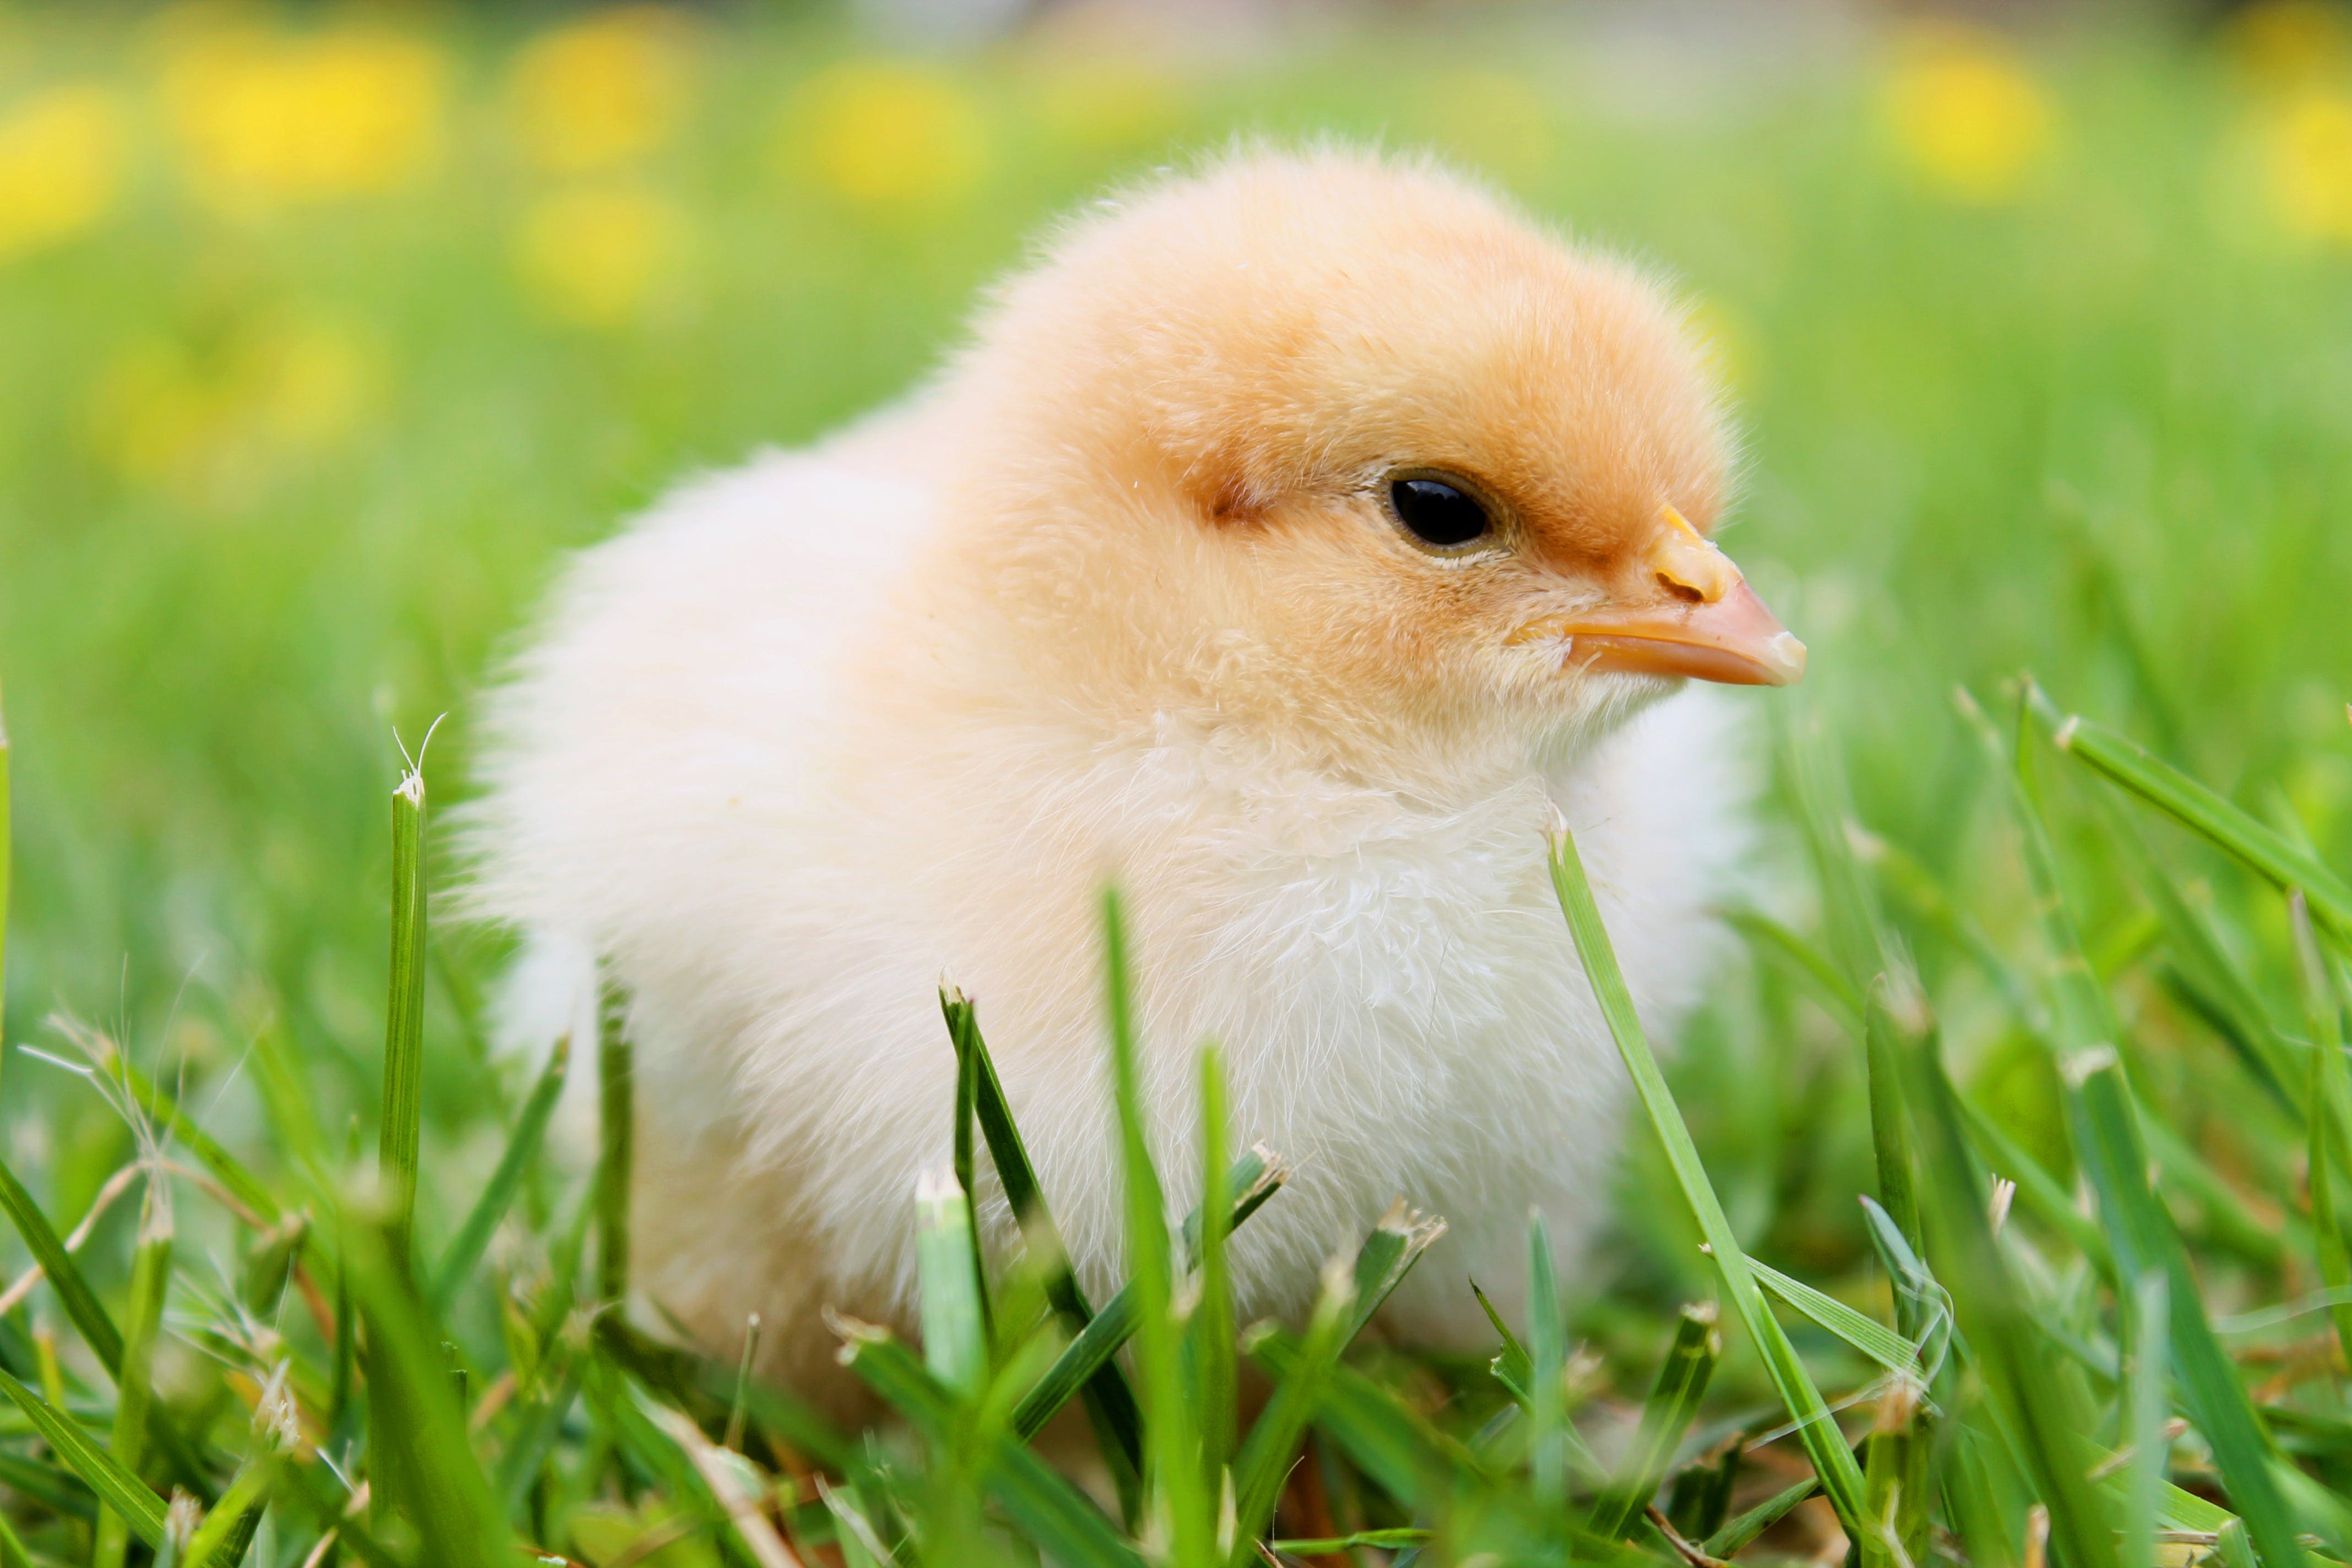 White Duckling on Grass